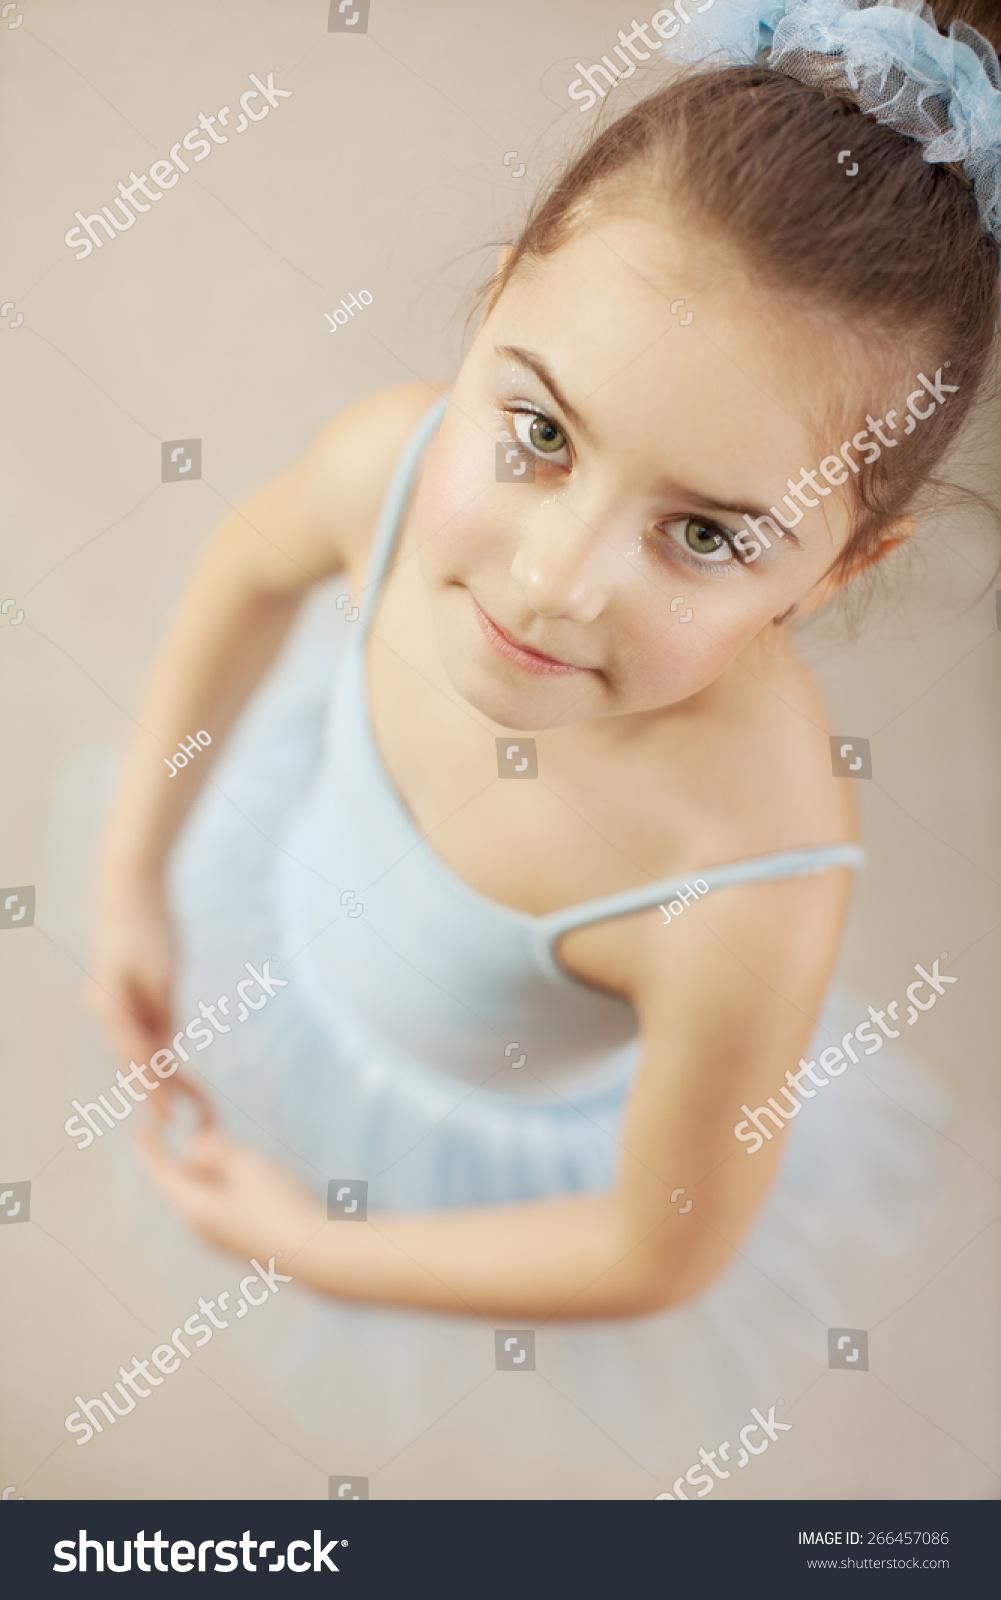 c7ce534253d36b Adorable little ballerina dancer posing in ballet studio. She is wearing  blue leotard and tutu